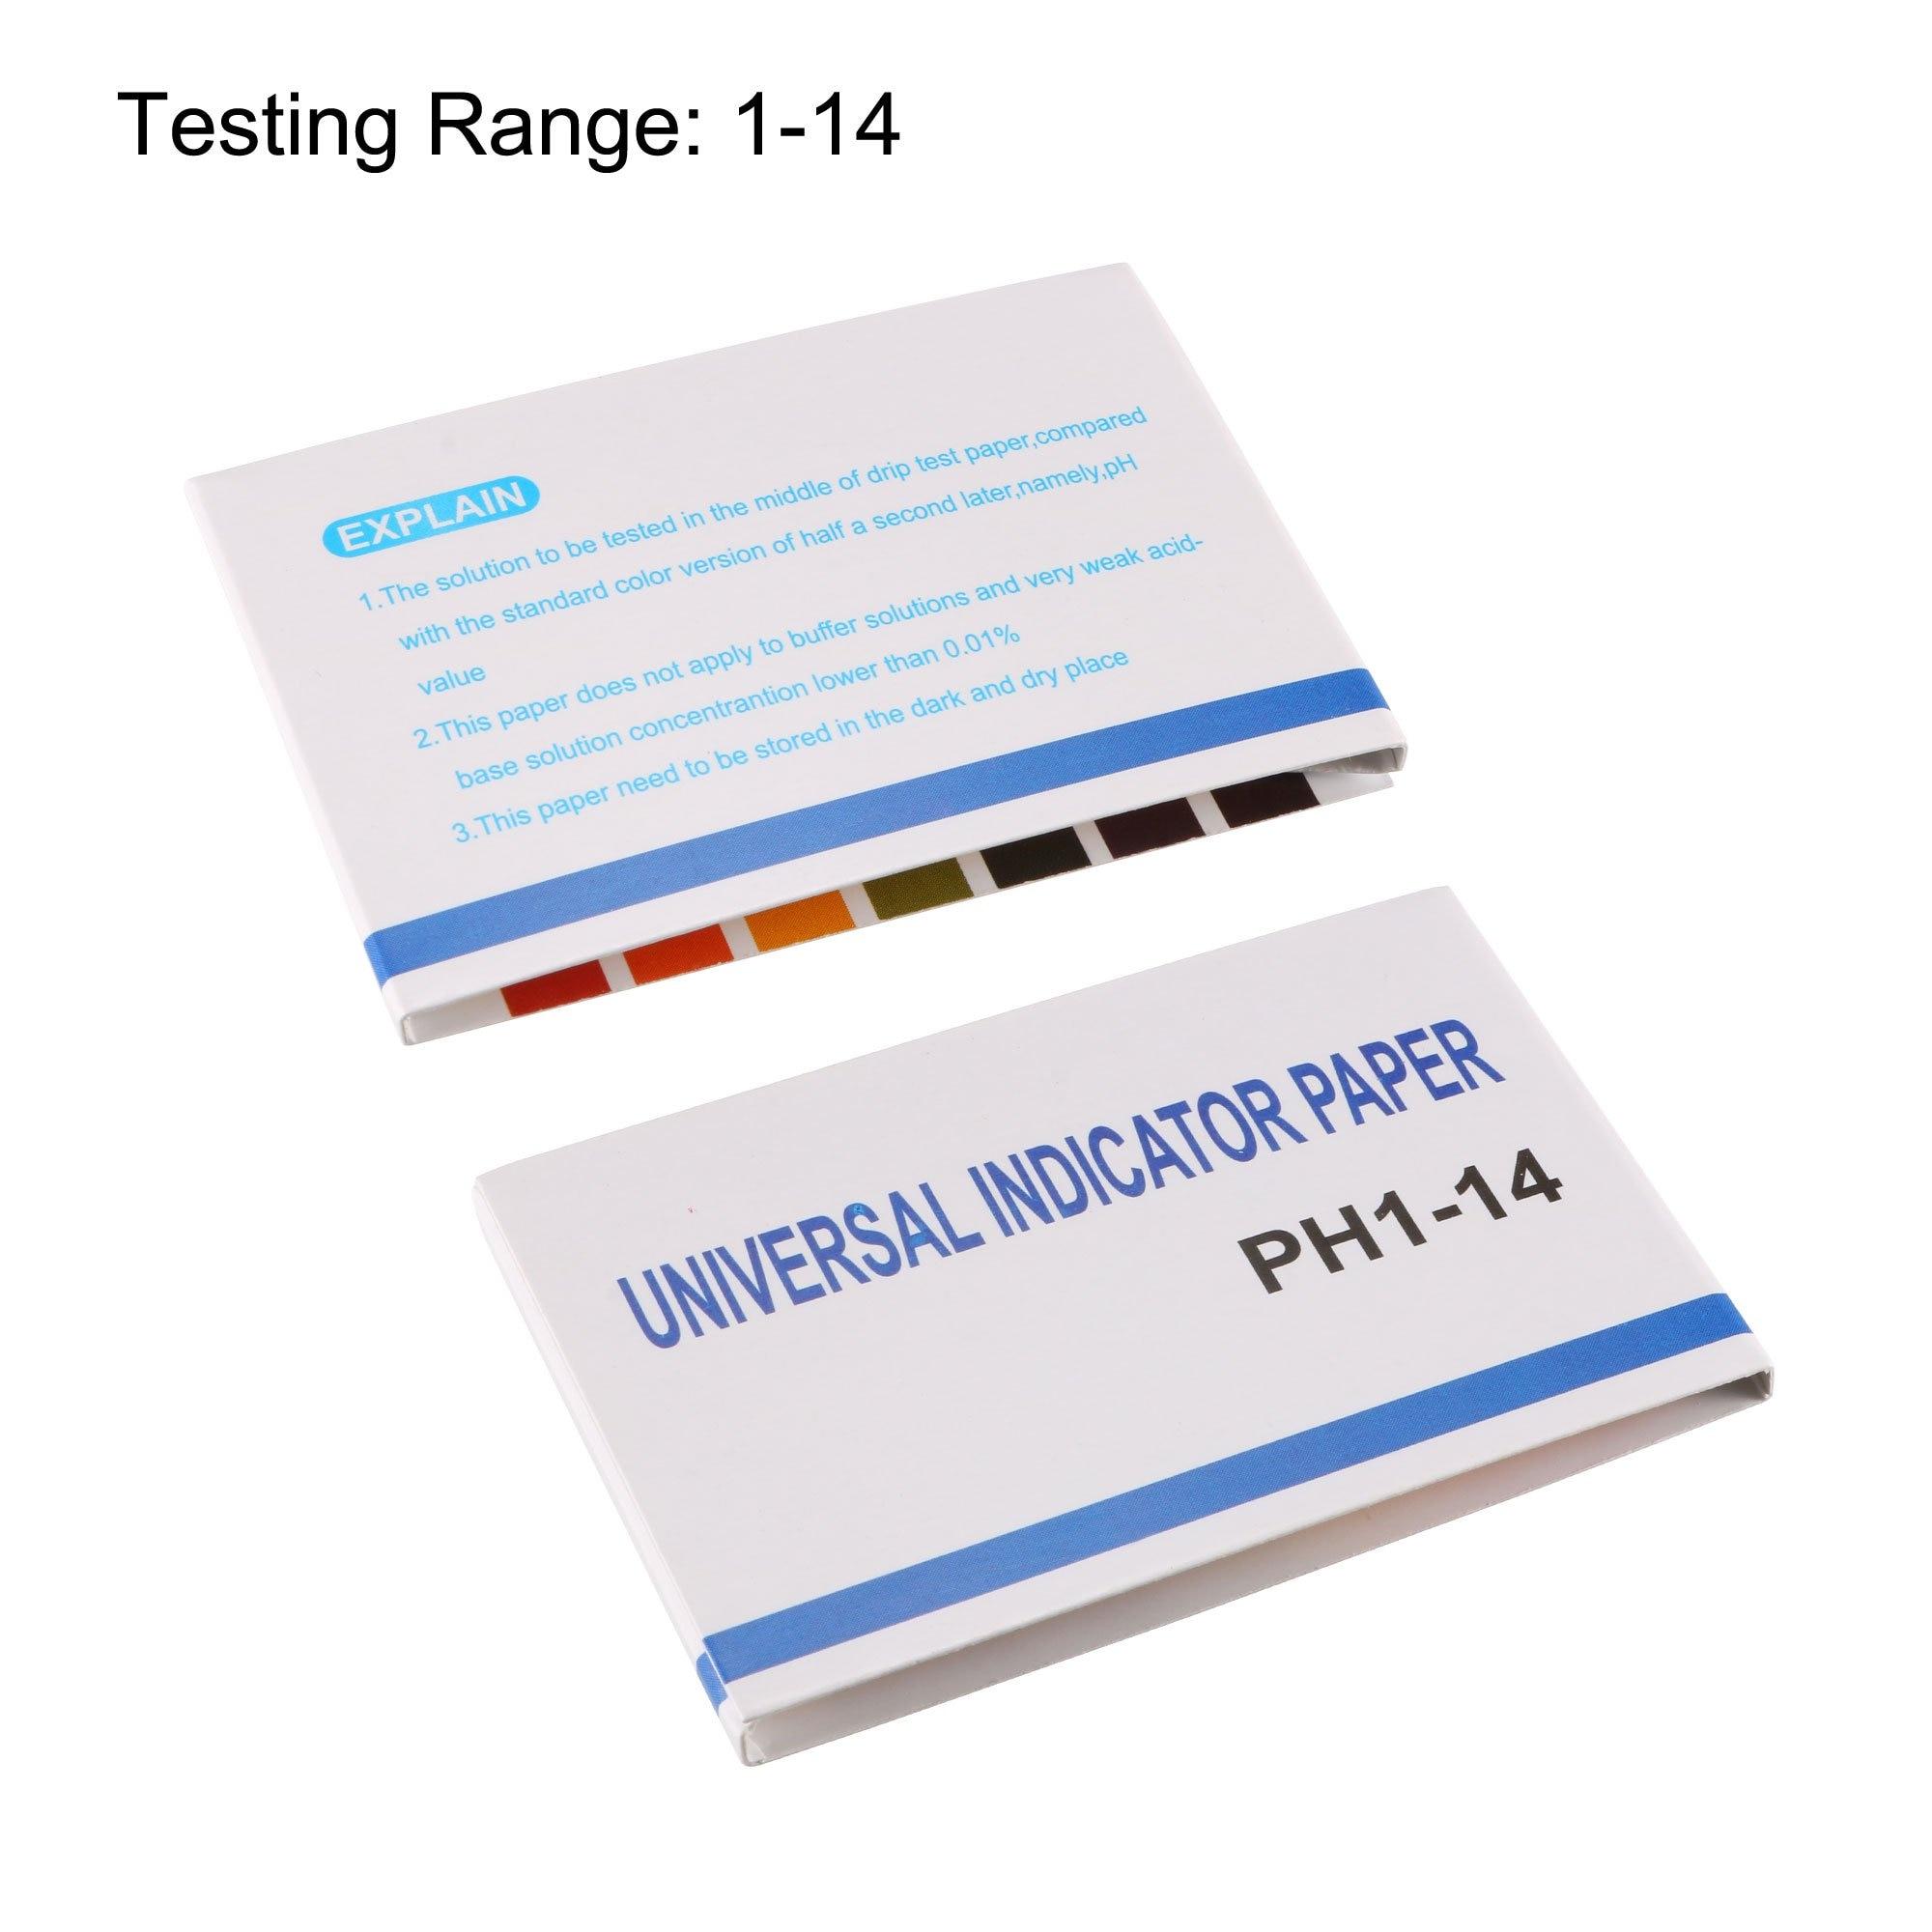 80 strips short range ph alkaline acid 0 5 5 0 indicator litmus paper ph test strips 30%off pH Test Strips 80 PCS Universal Litmus Paper (pH 1-14) to Test Water Quality, Soil, Urine & Saliva, Cosmetics, Alkaline & Diabet